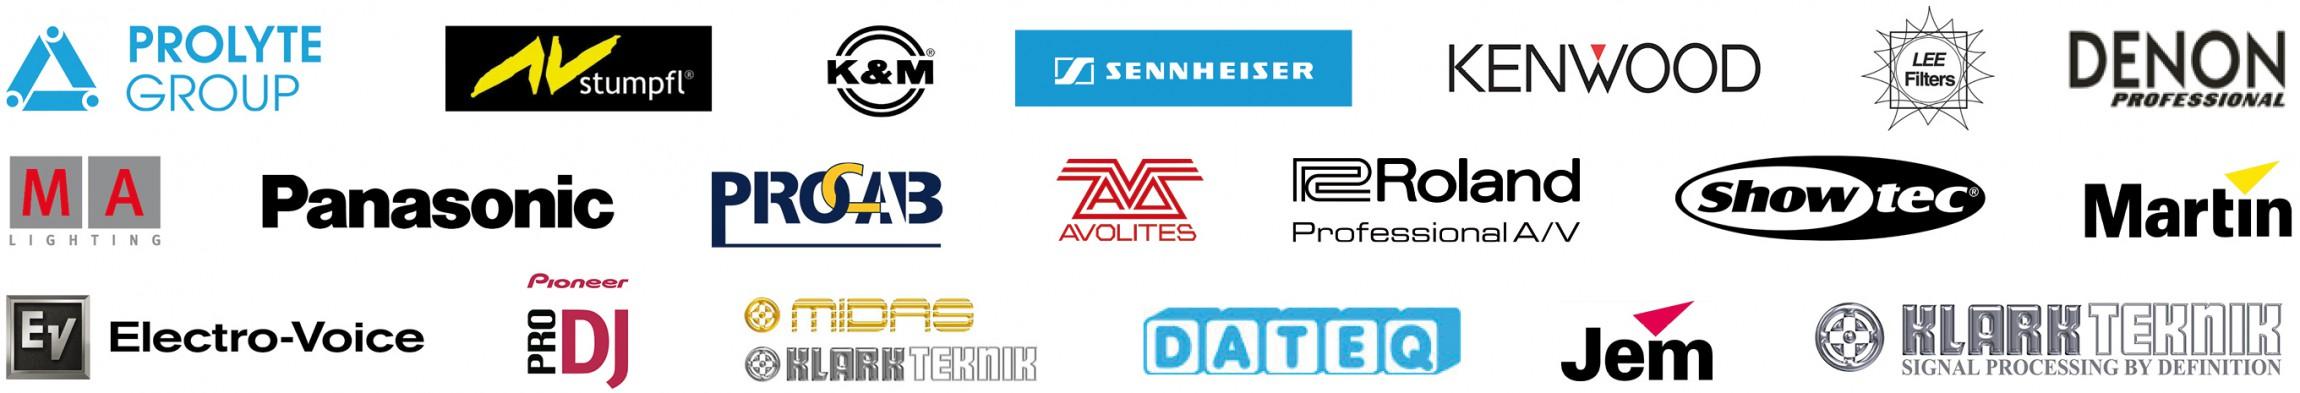 Liquidx logos